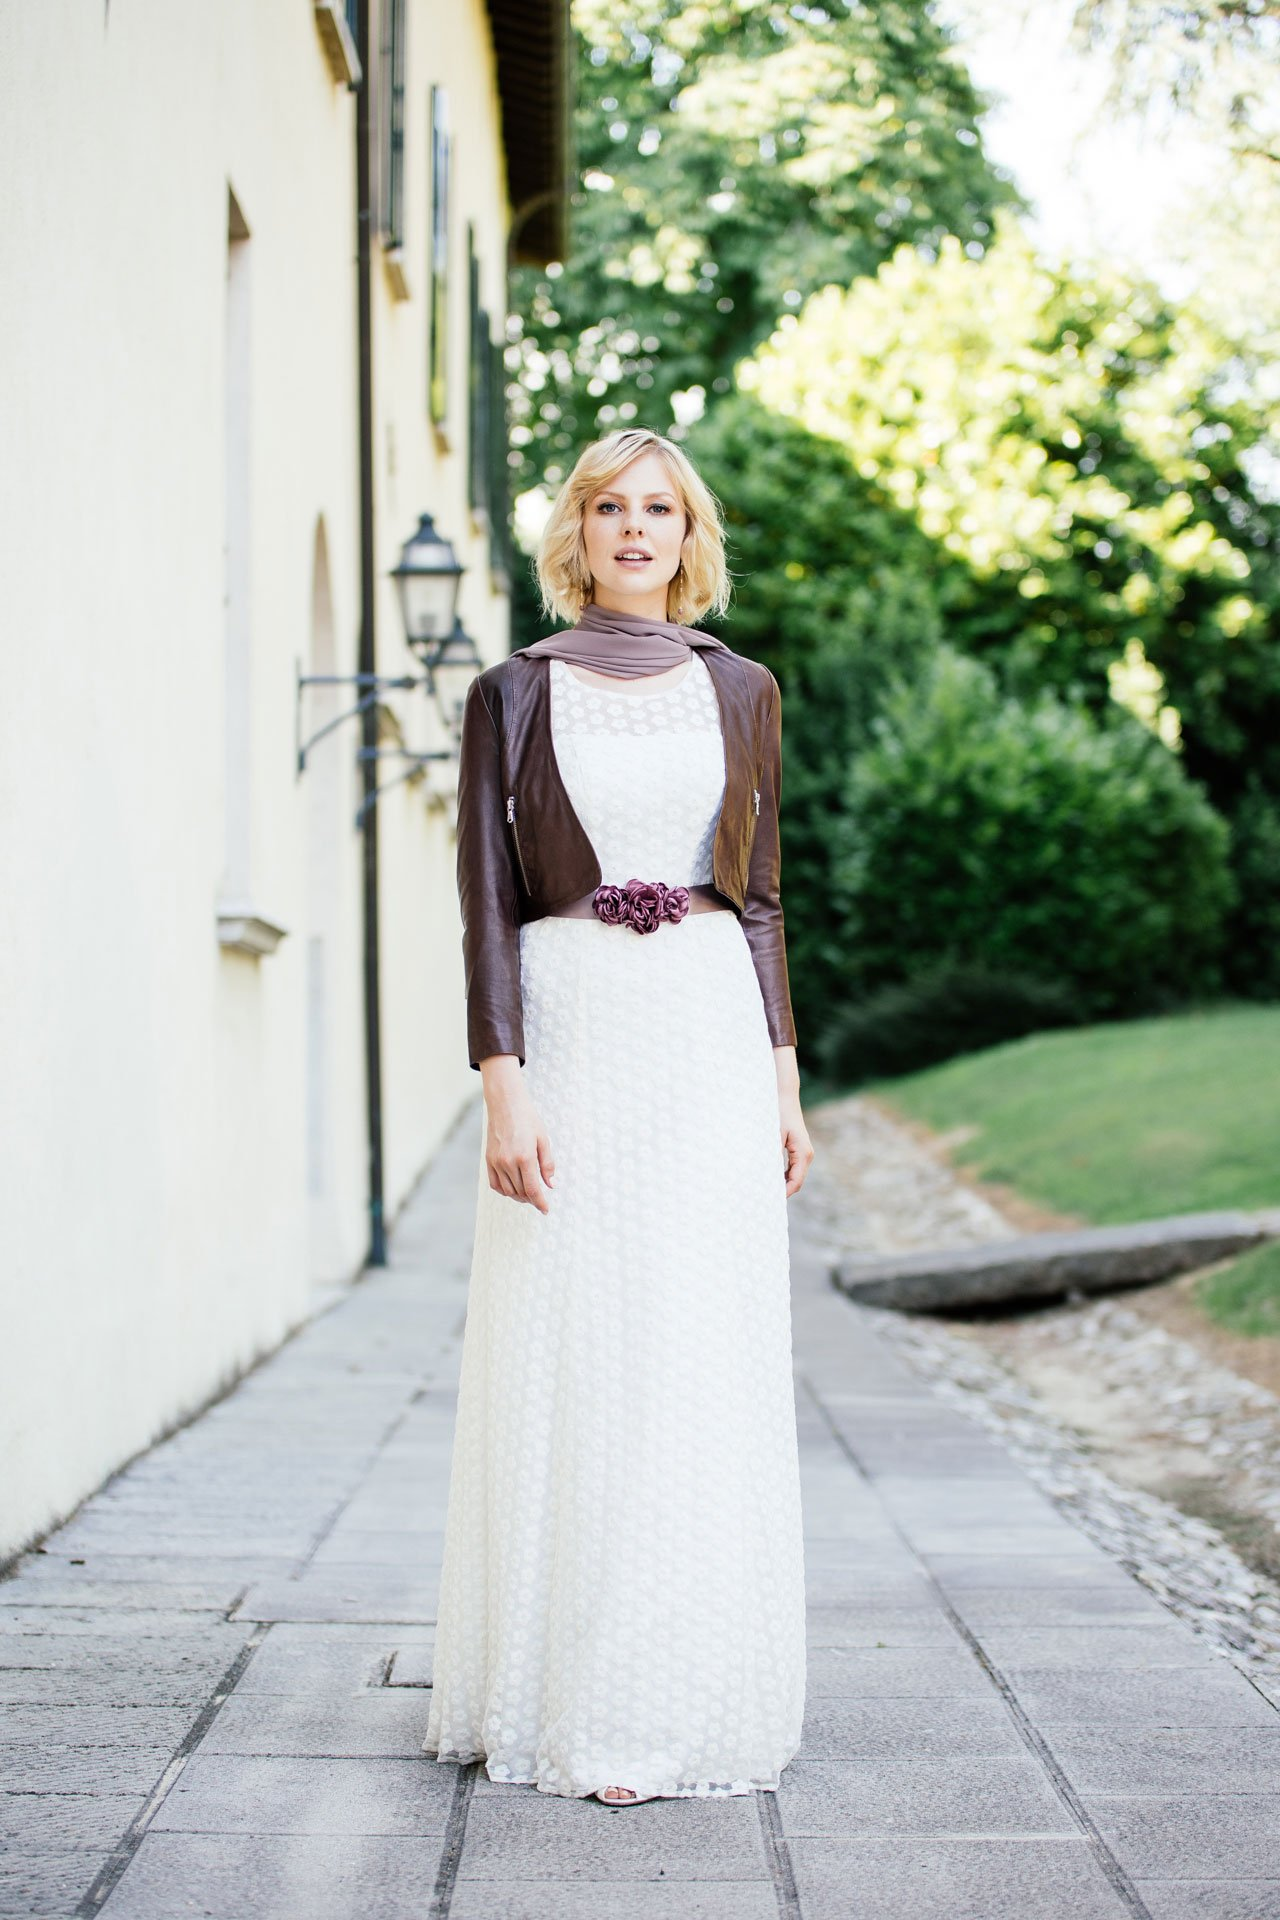 Brautkleid Spitze markant mit Lederjacke